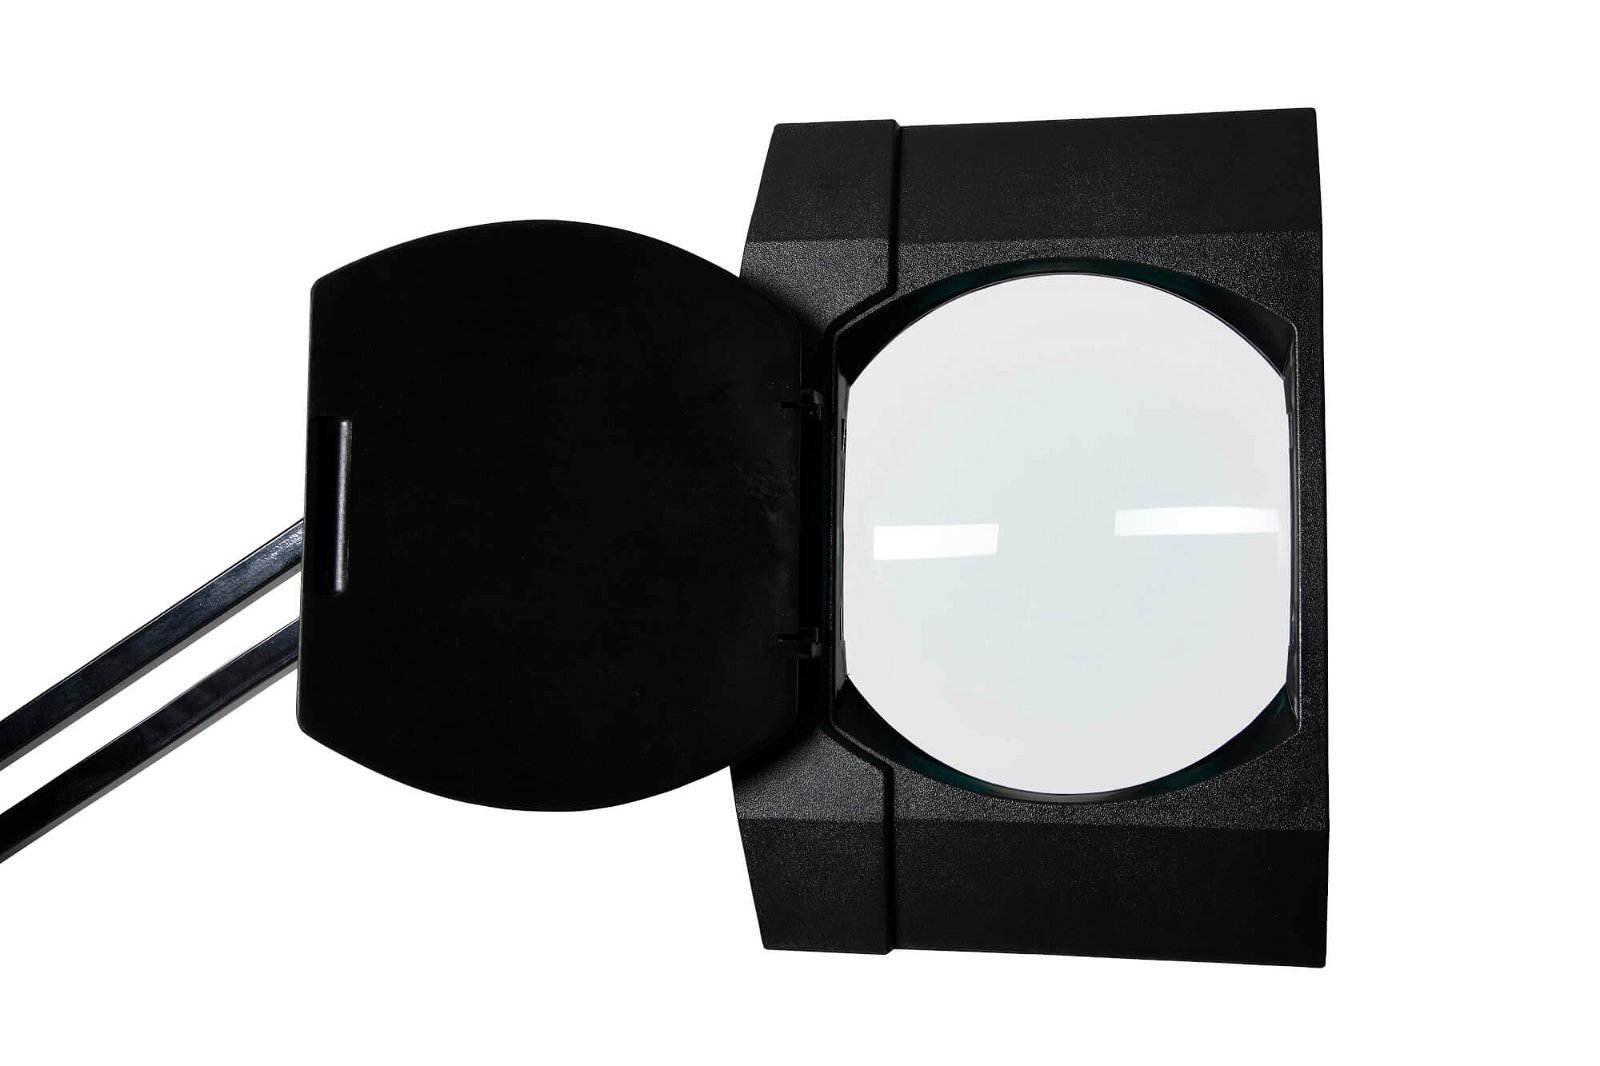 LED-Lupenleuchte MAULvitrum, mit Klemmfuß, schwarz